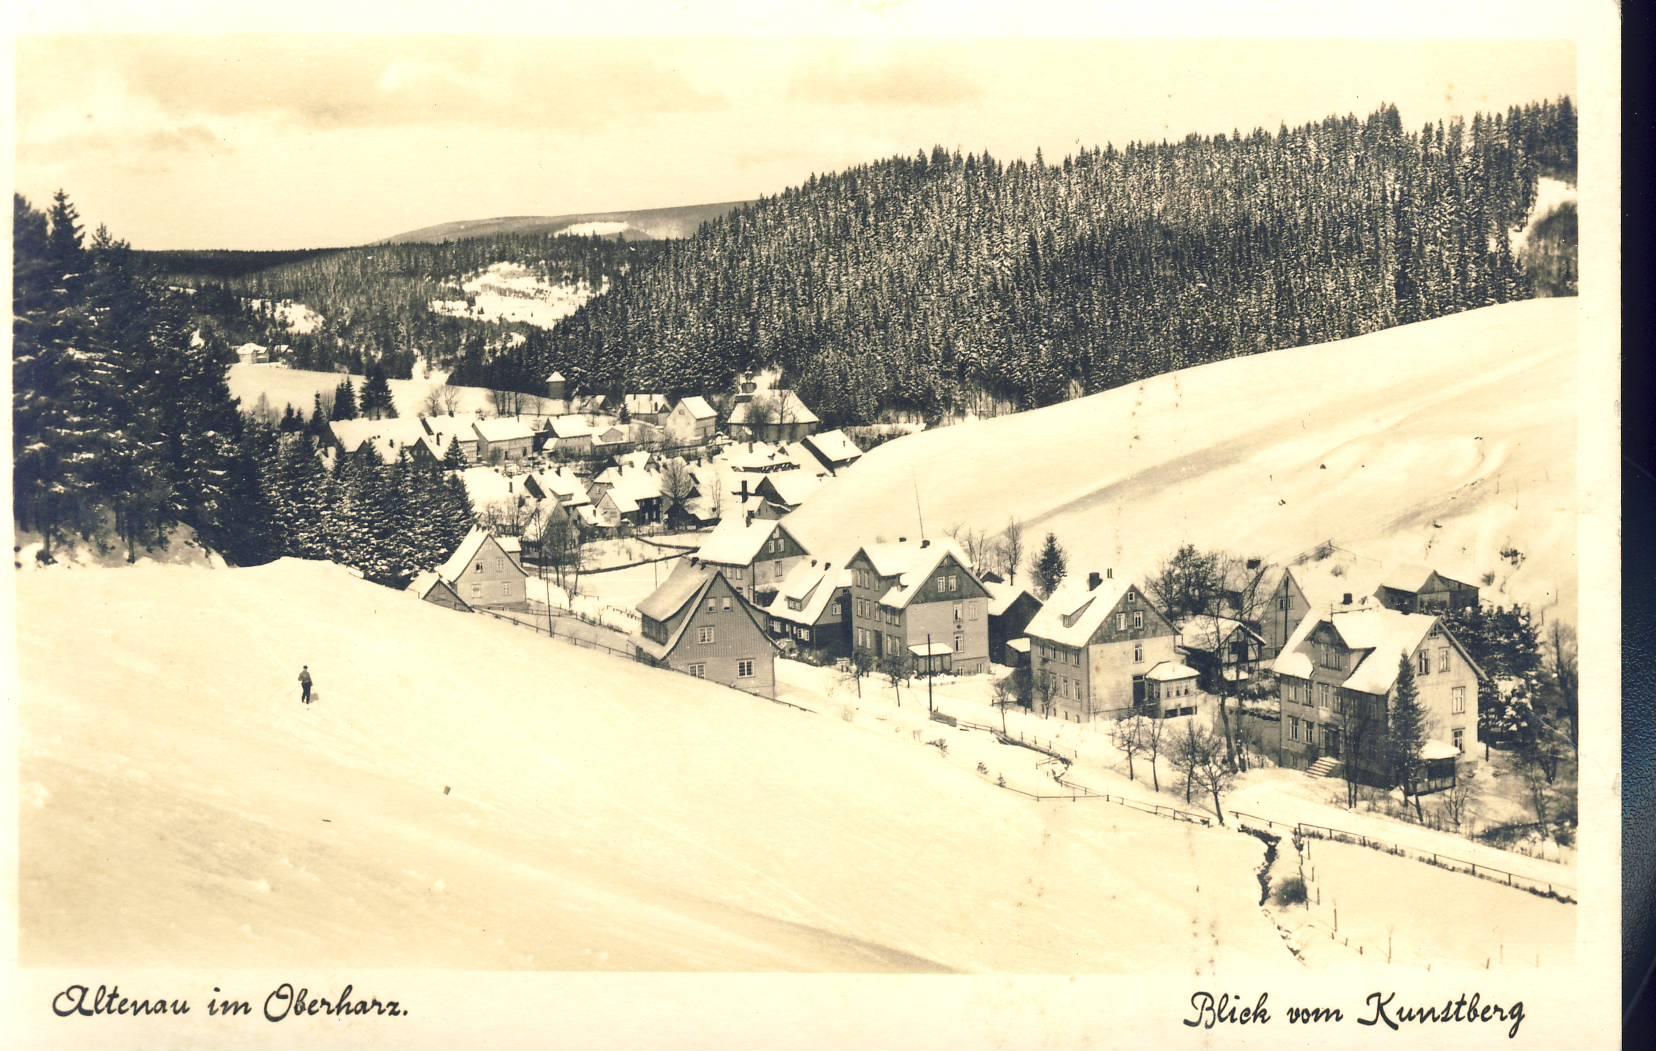 Altenau im Oberharz Blick vom Kunstberg Old Postcard refP8 Pre-owned used condition.